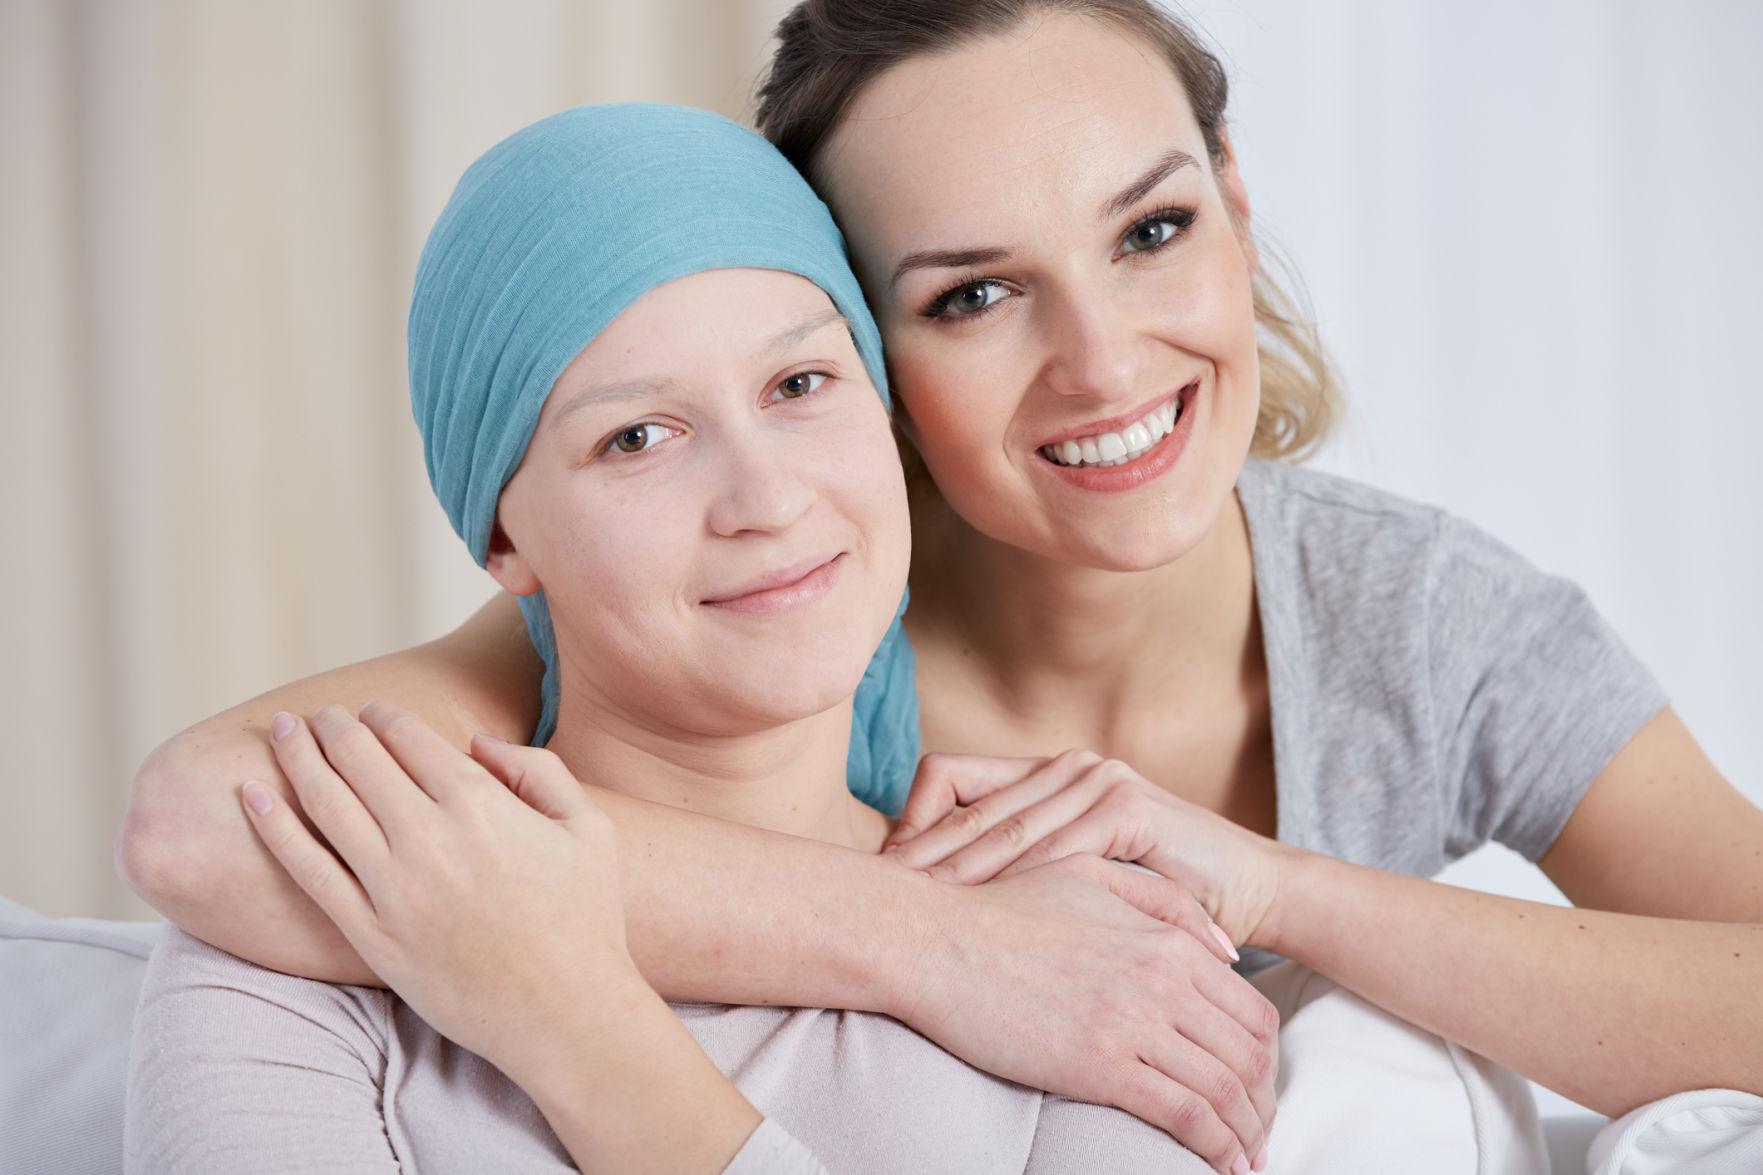 Southeast Nebraska Cancer Center